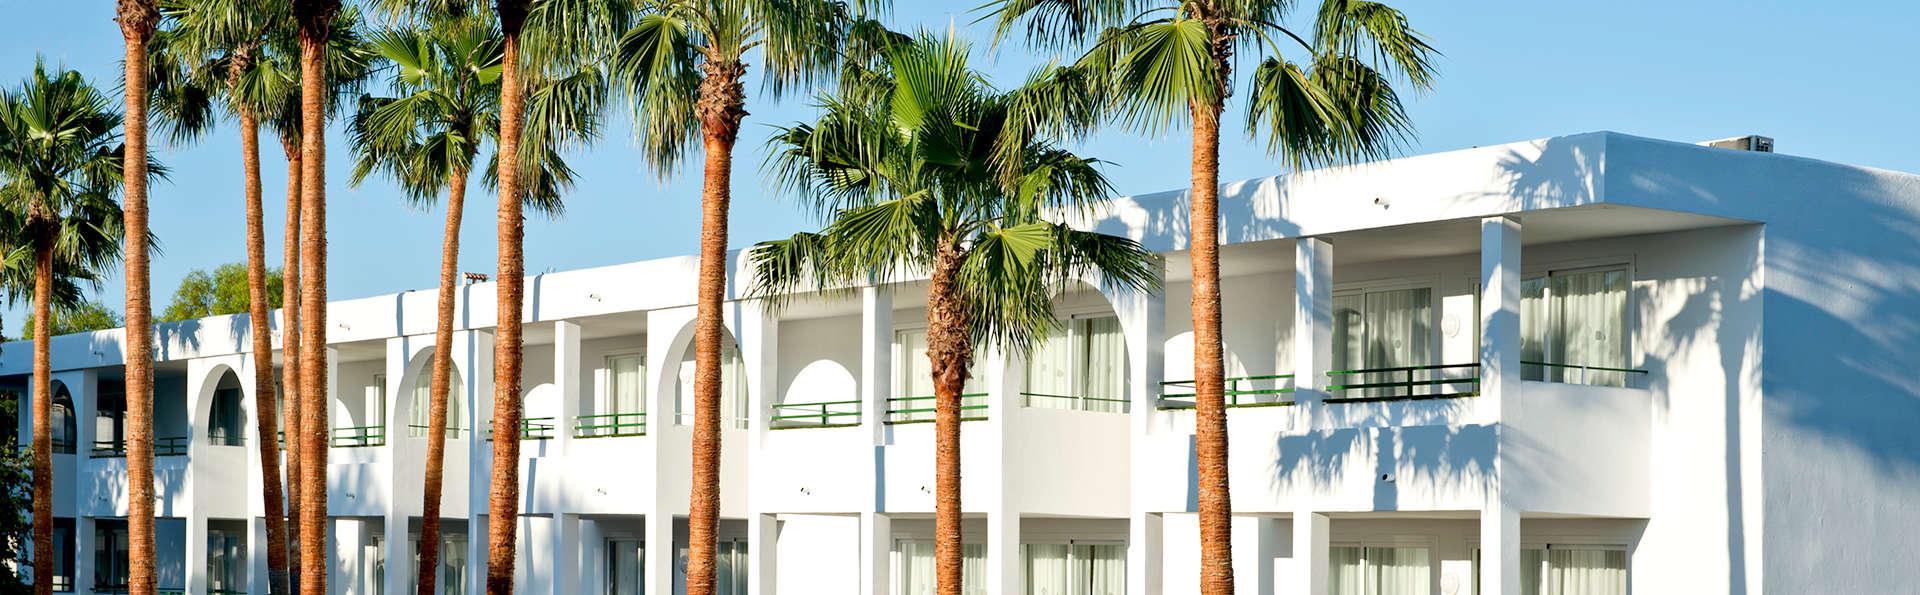 Apartotel Pierre & Vacances Mallorca Cecilia - EDIT_N2_FRONT2.jpg